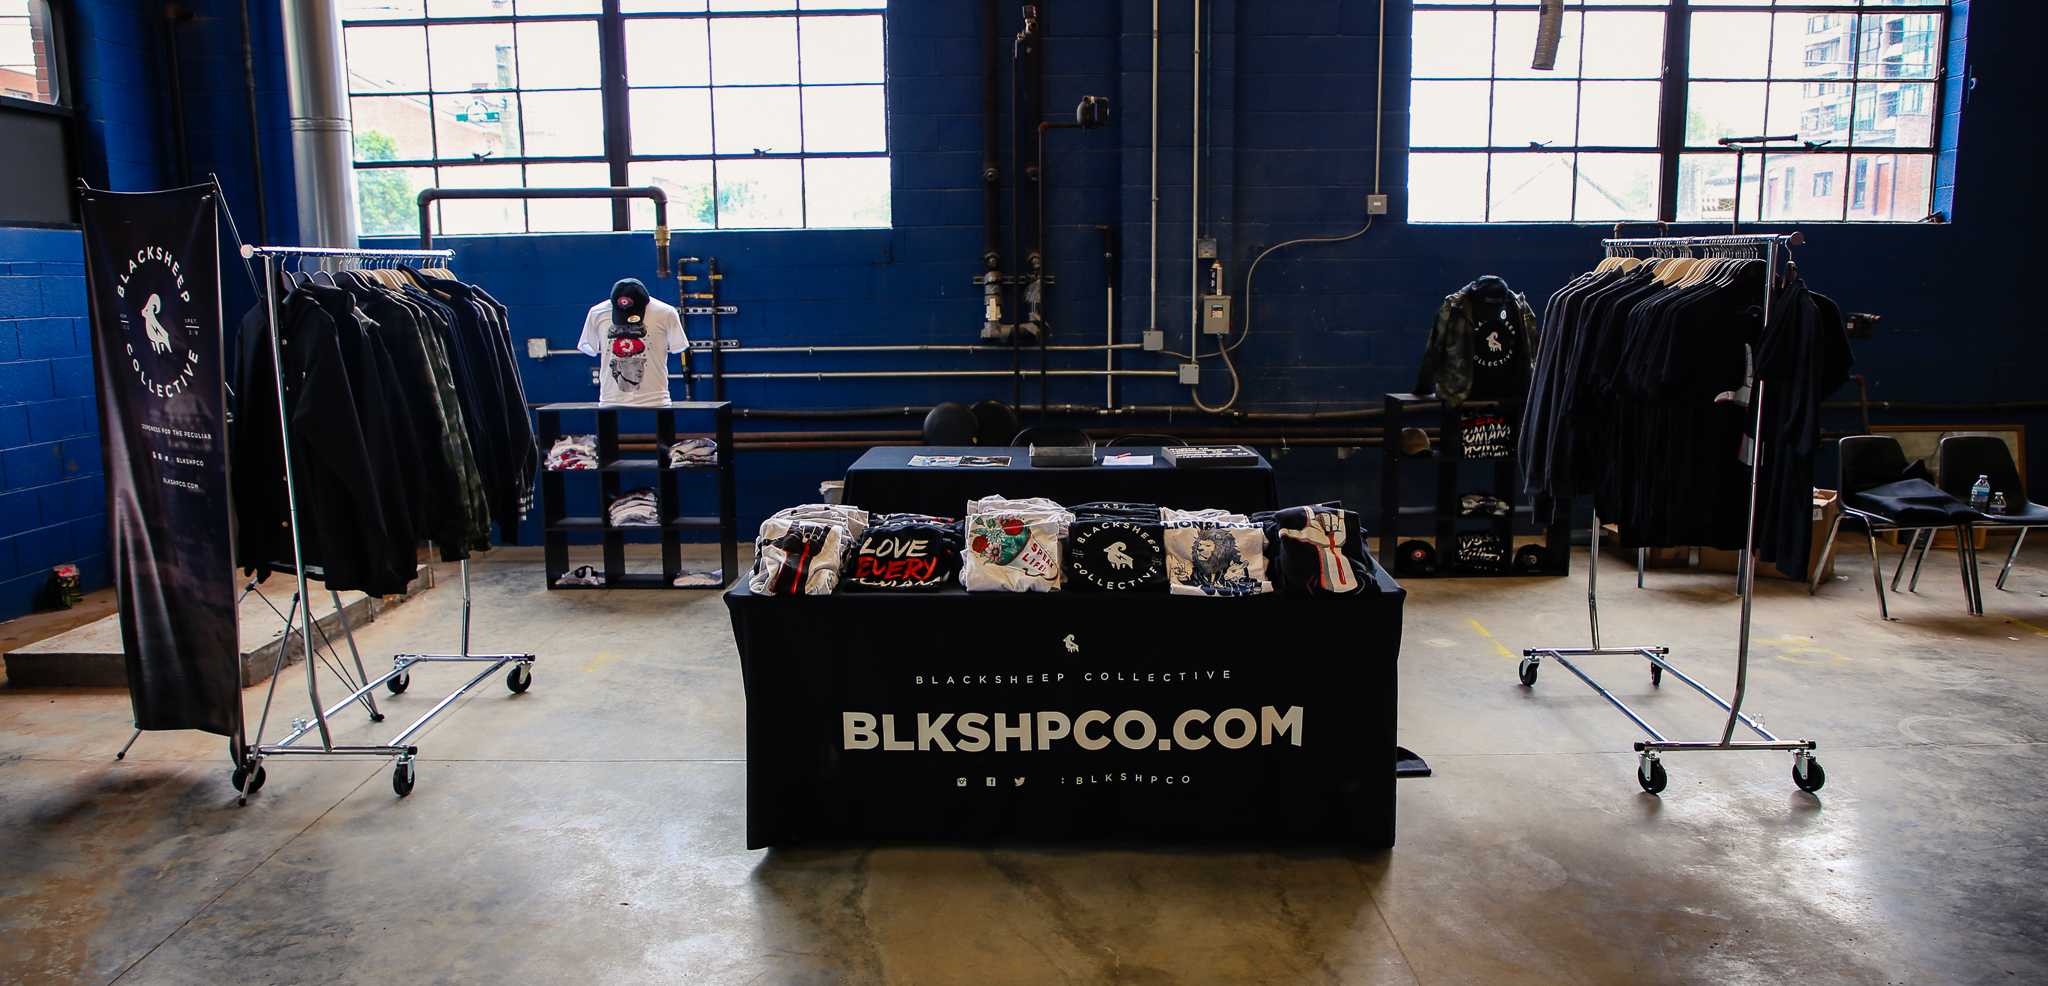 Blacksheep Collective, Season 2 Vendor